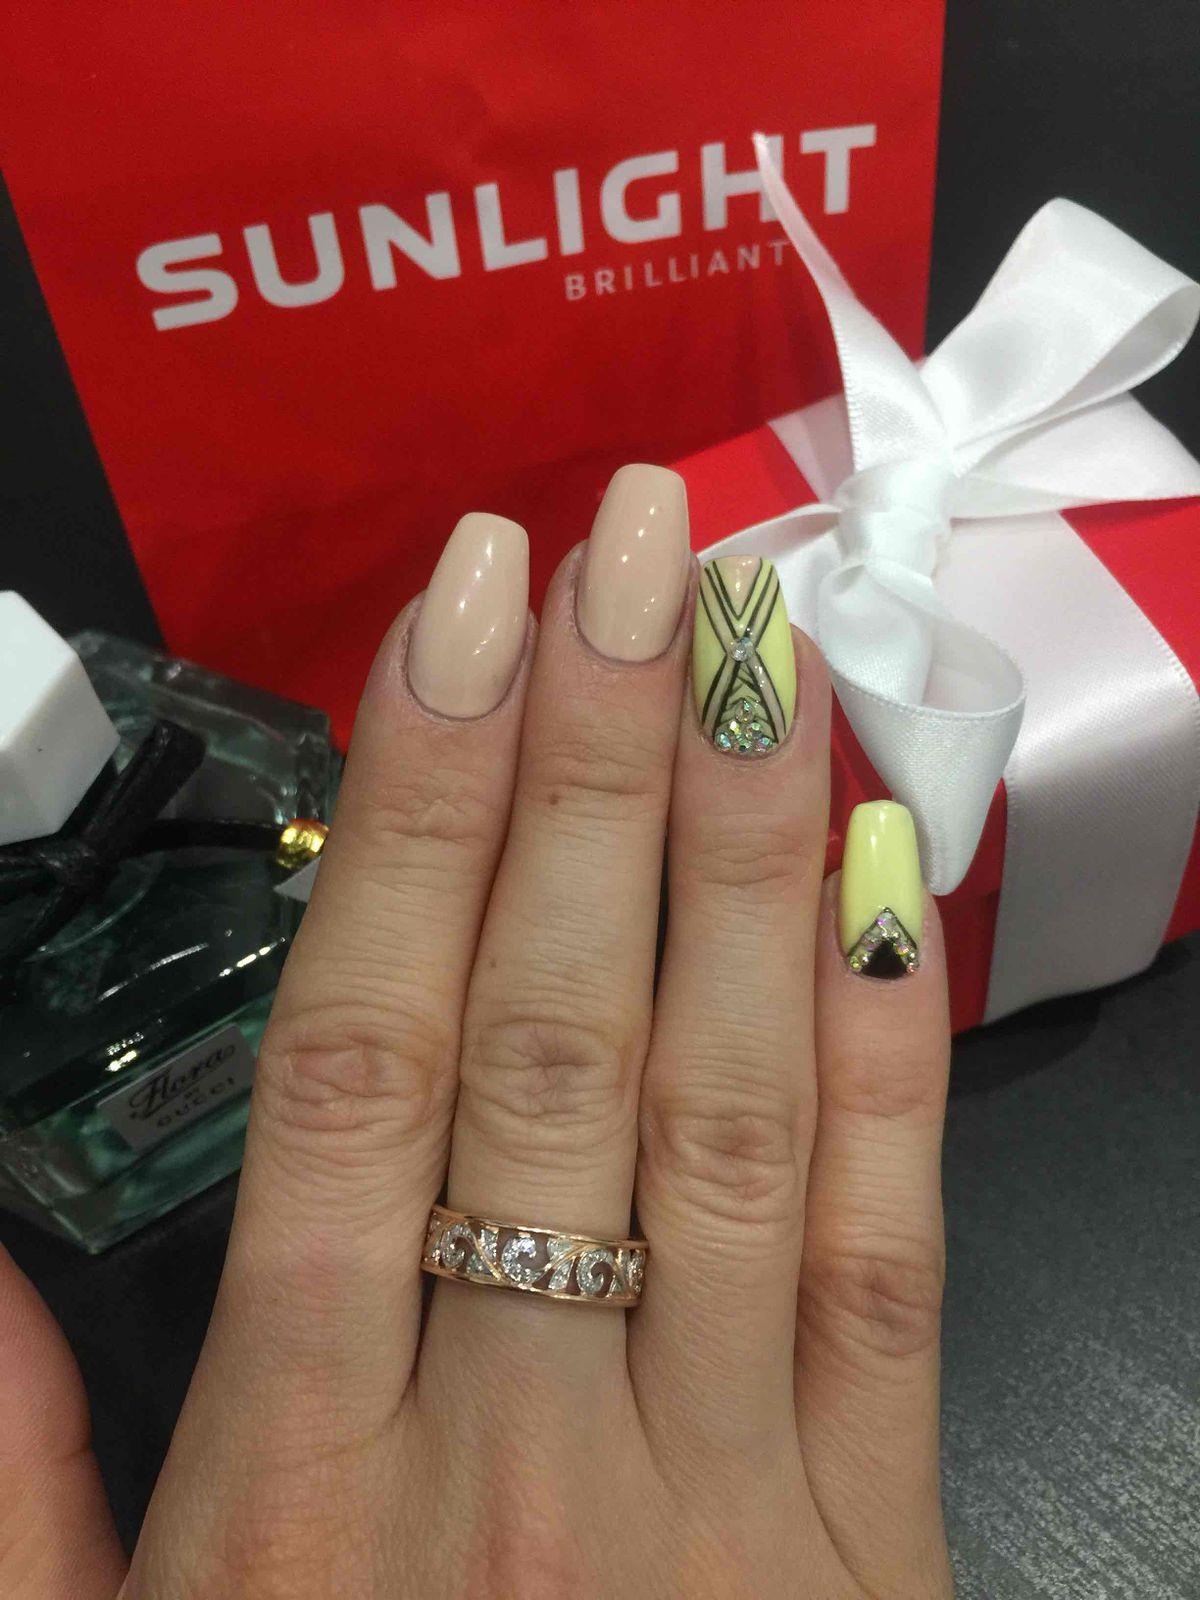 Получила в качестве подарка колечко с бриллиантами